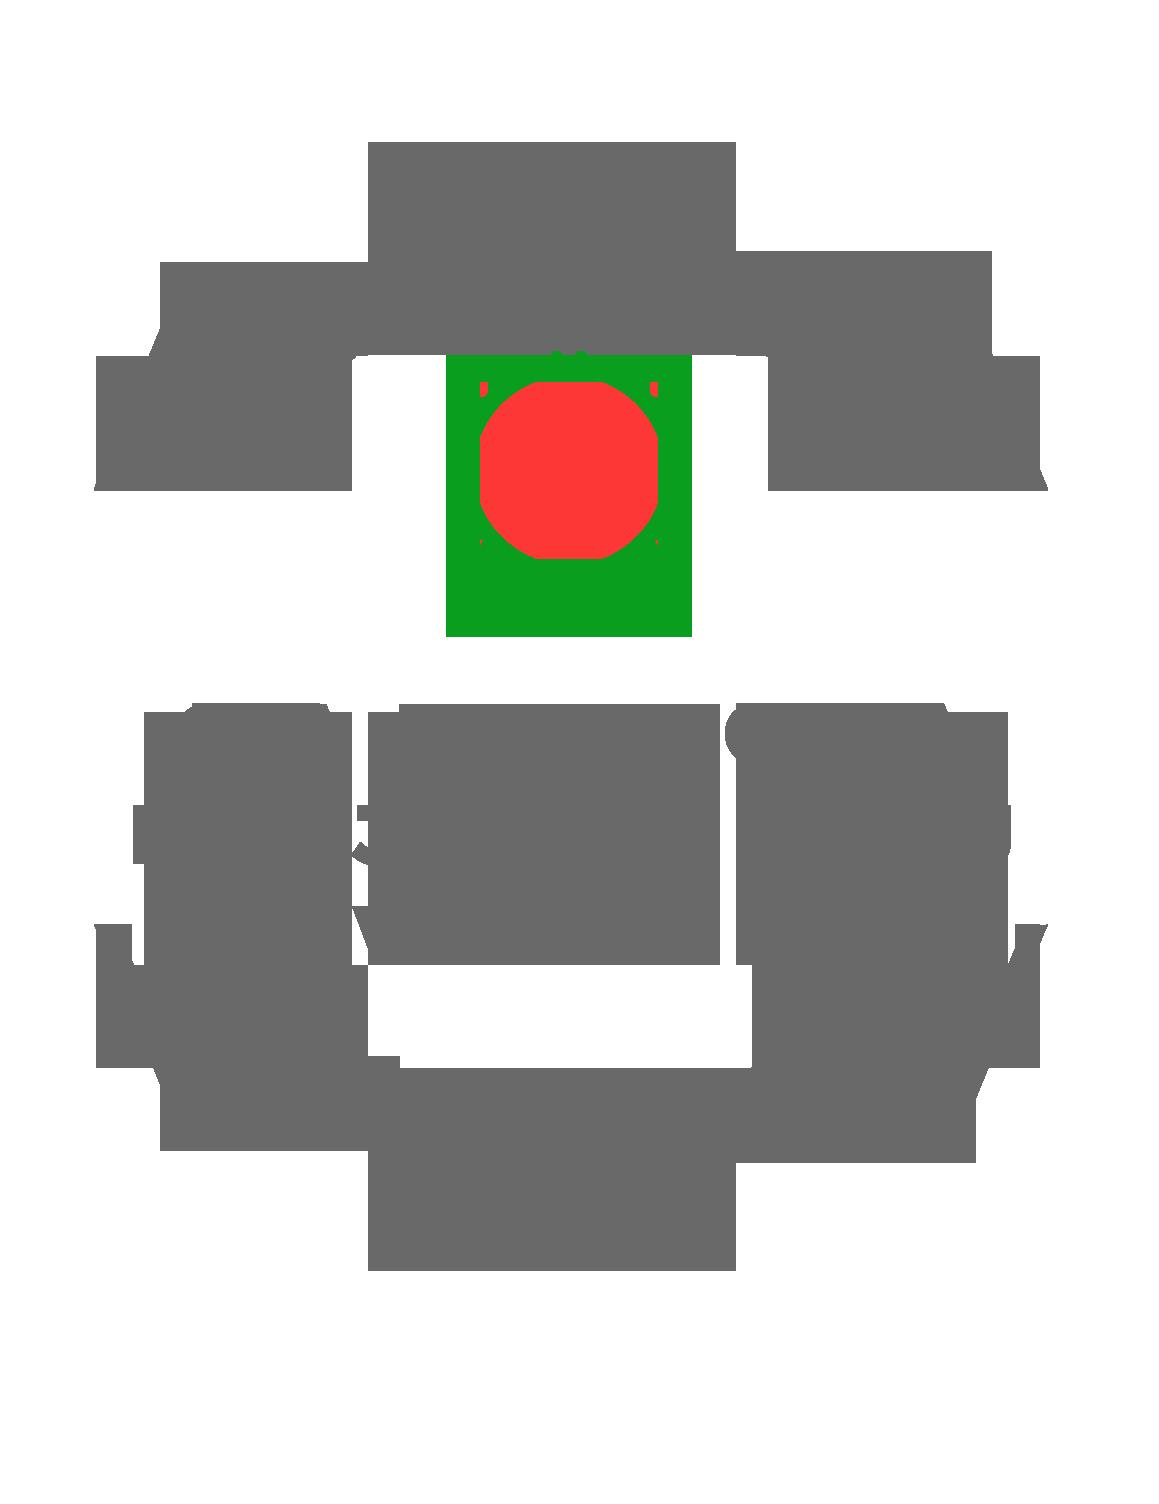 sedacia_suprava_sedacka_garancia_kvality